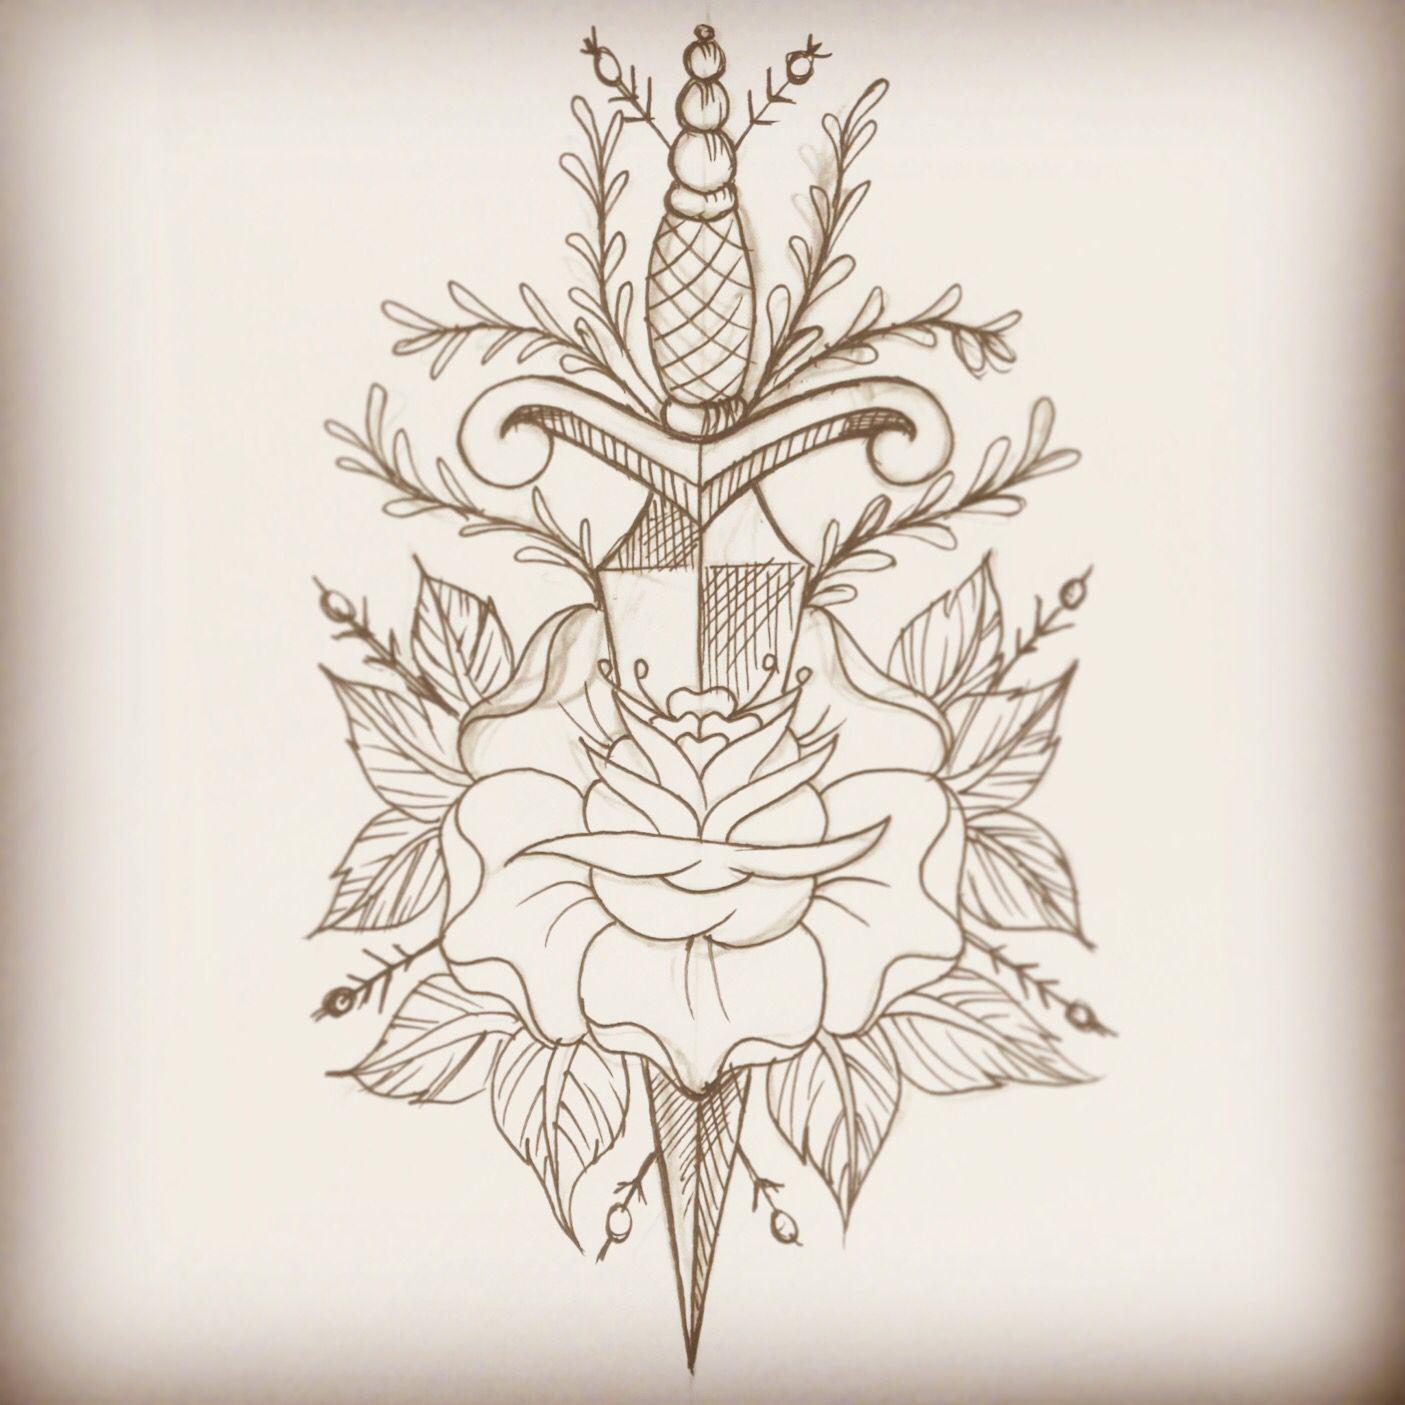 Tattoo old school tatuaggi old school pin up significato e foto quotes - Old School Dagger And Rose Tattoo Flash Lhptattoo Www Facebook Com Lhptattoo